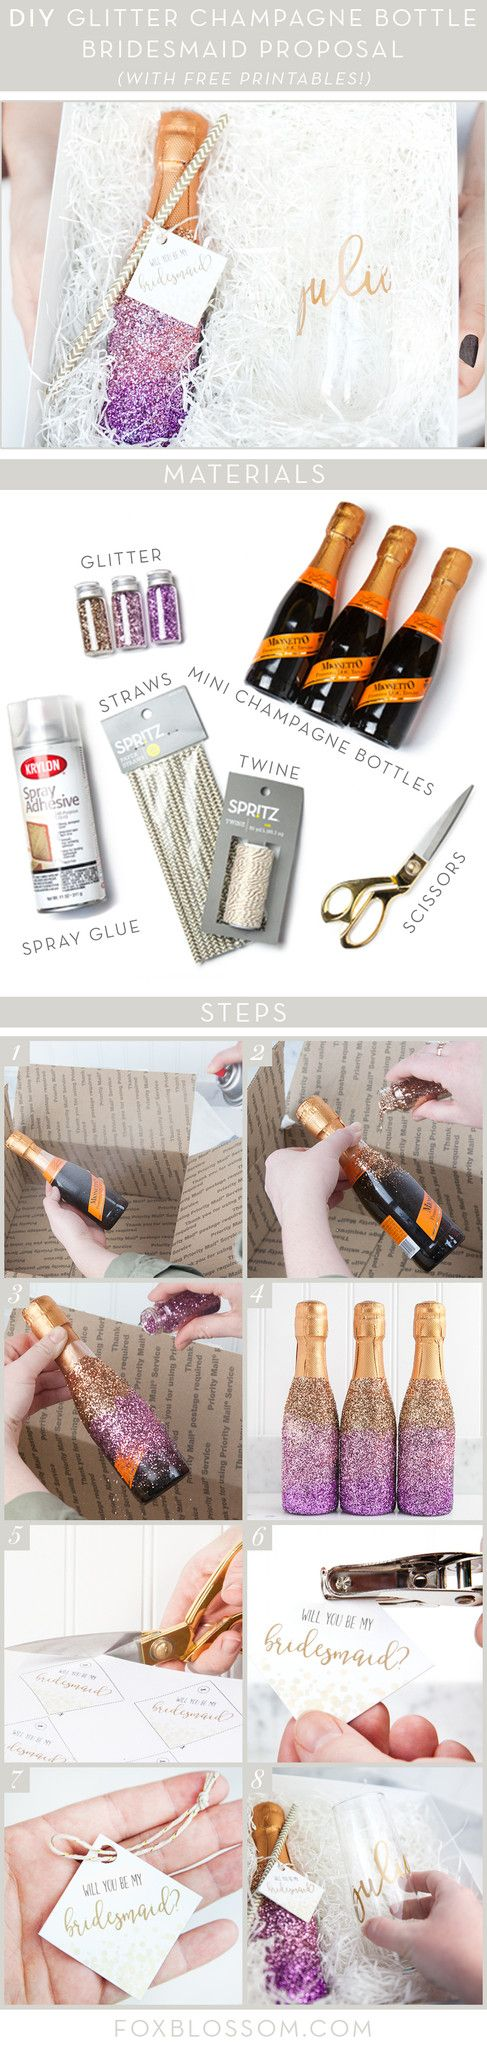 DIY Glitter Champagne Bridesmaid Proposal!